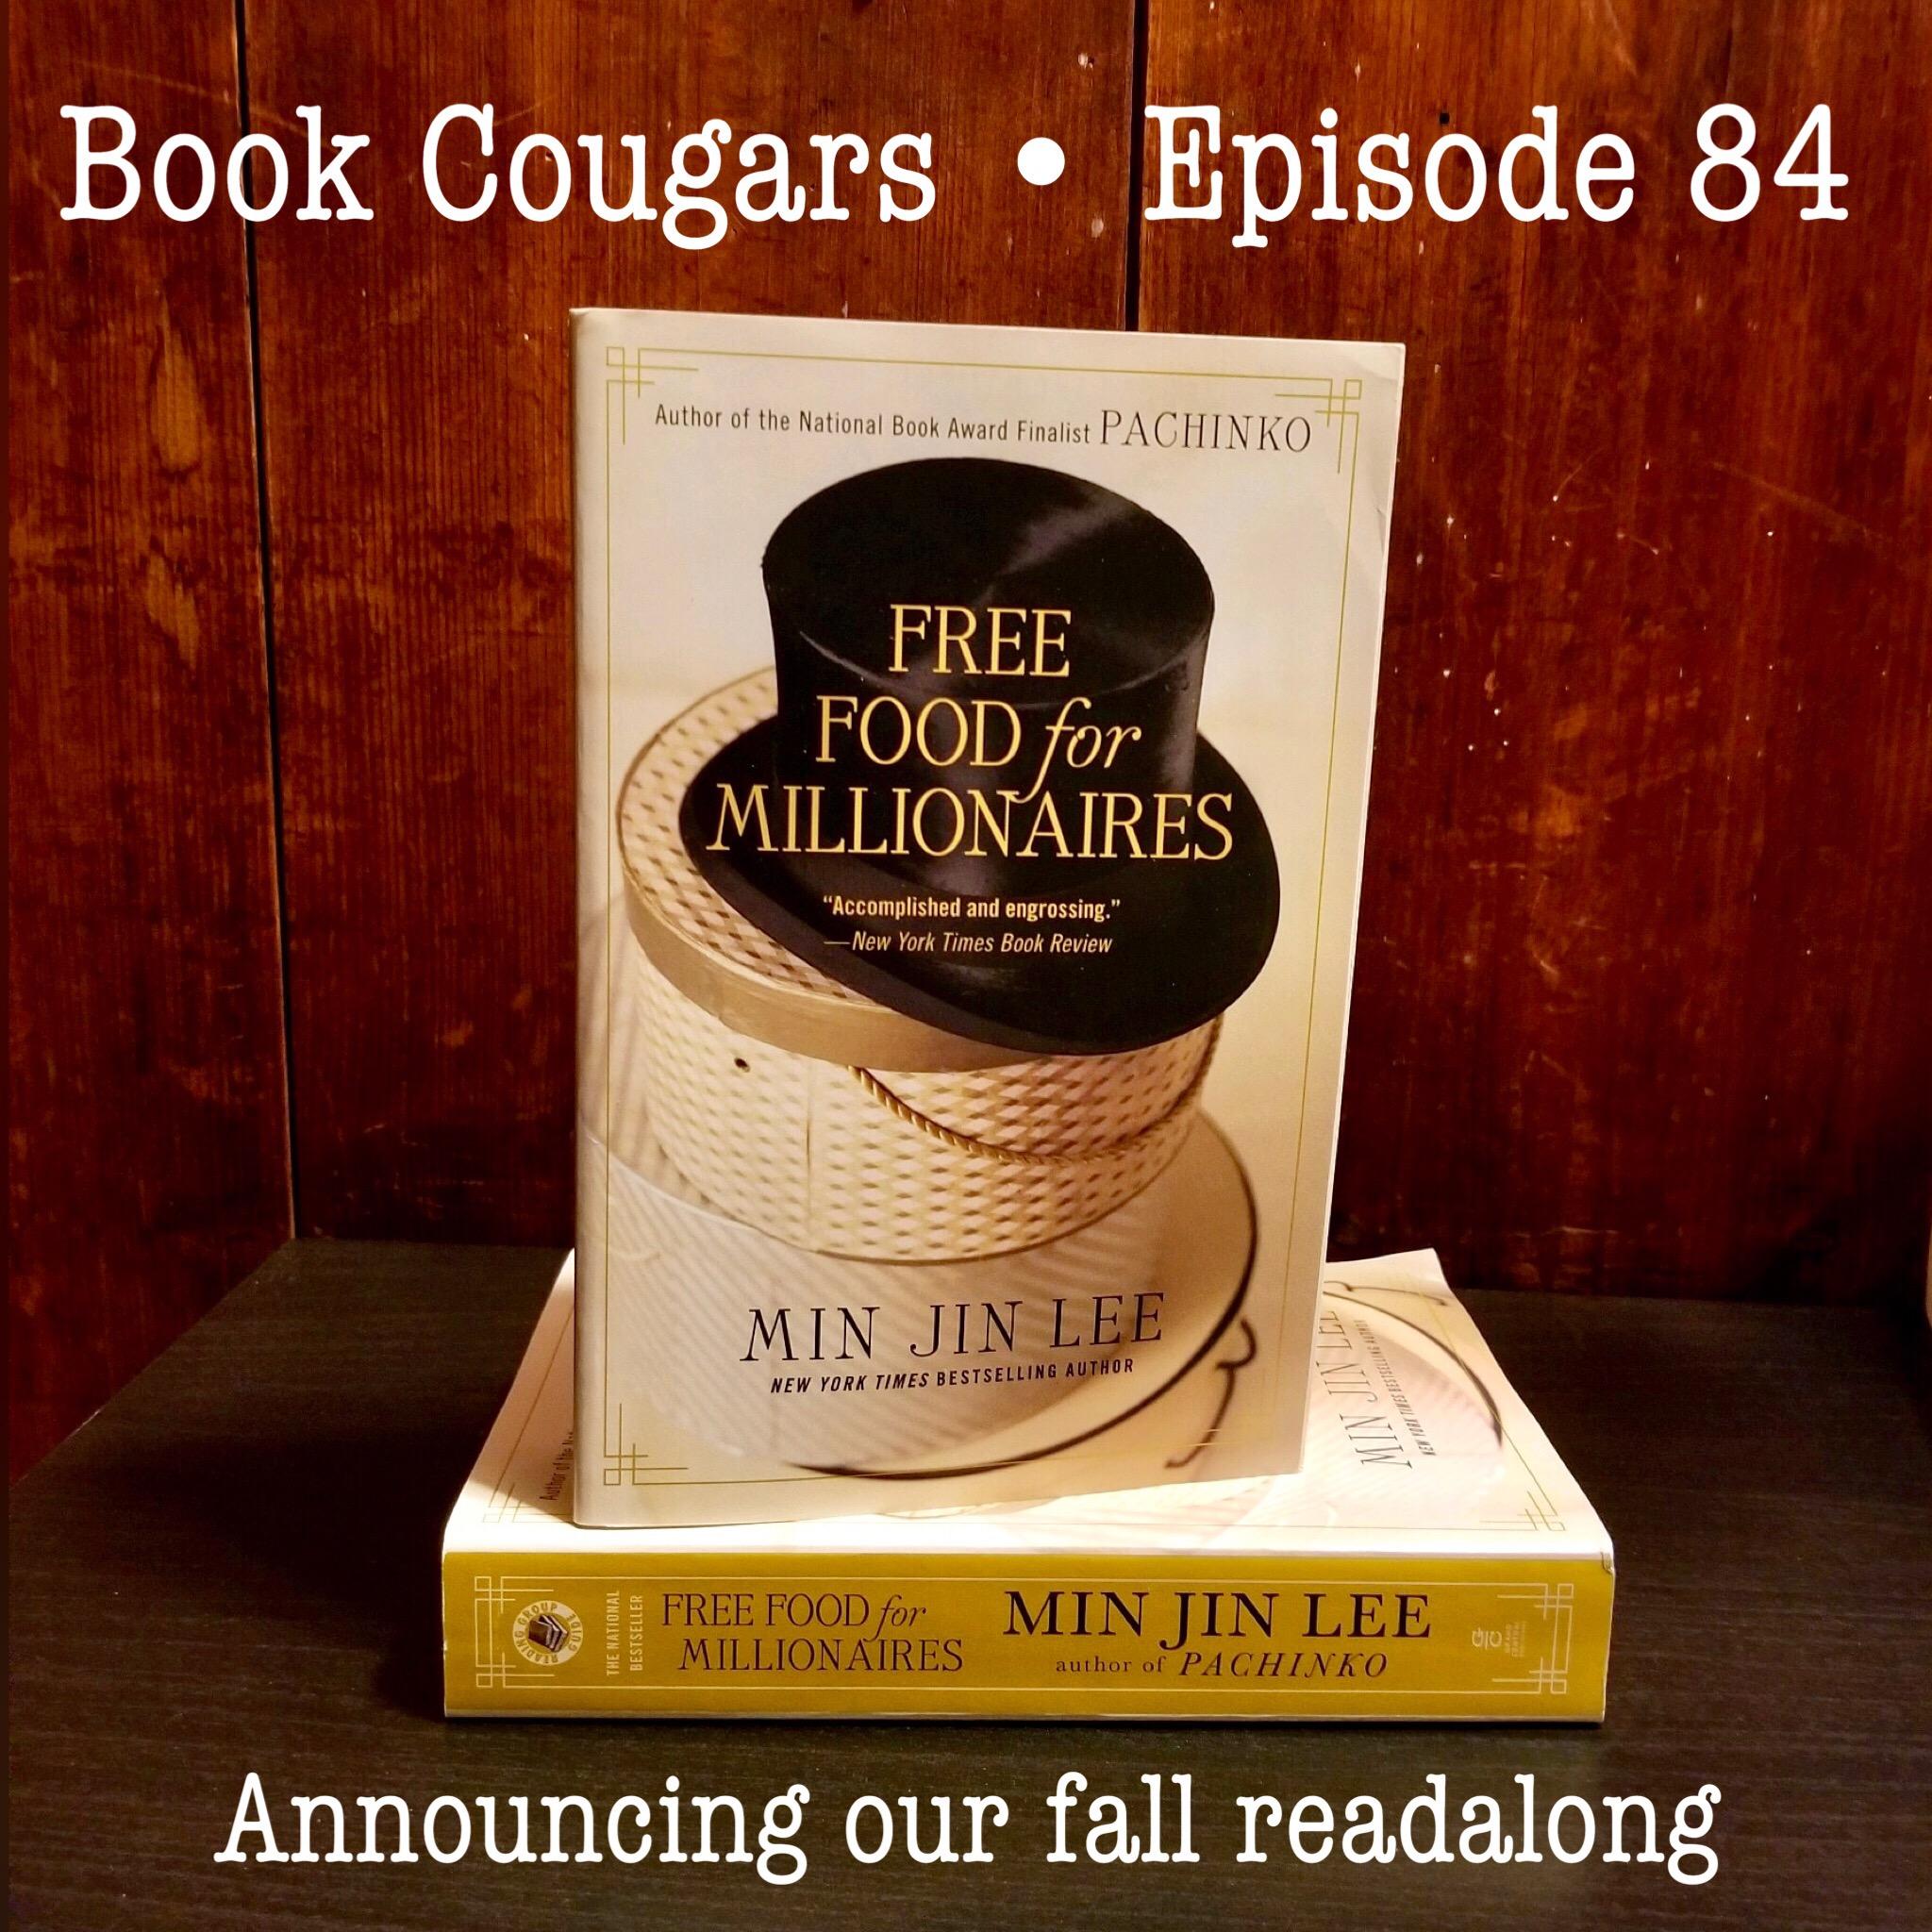 Book Cougars Podcast — Book Cougars Podcast